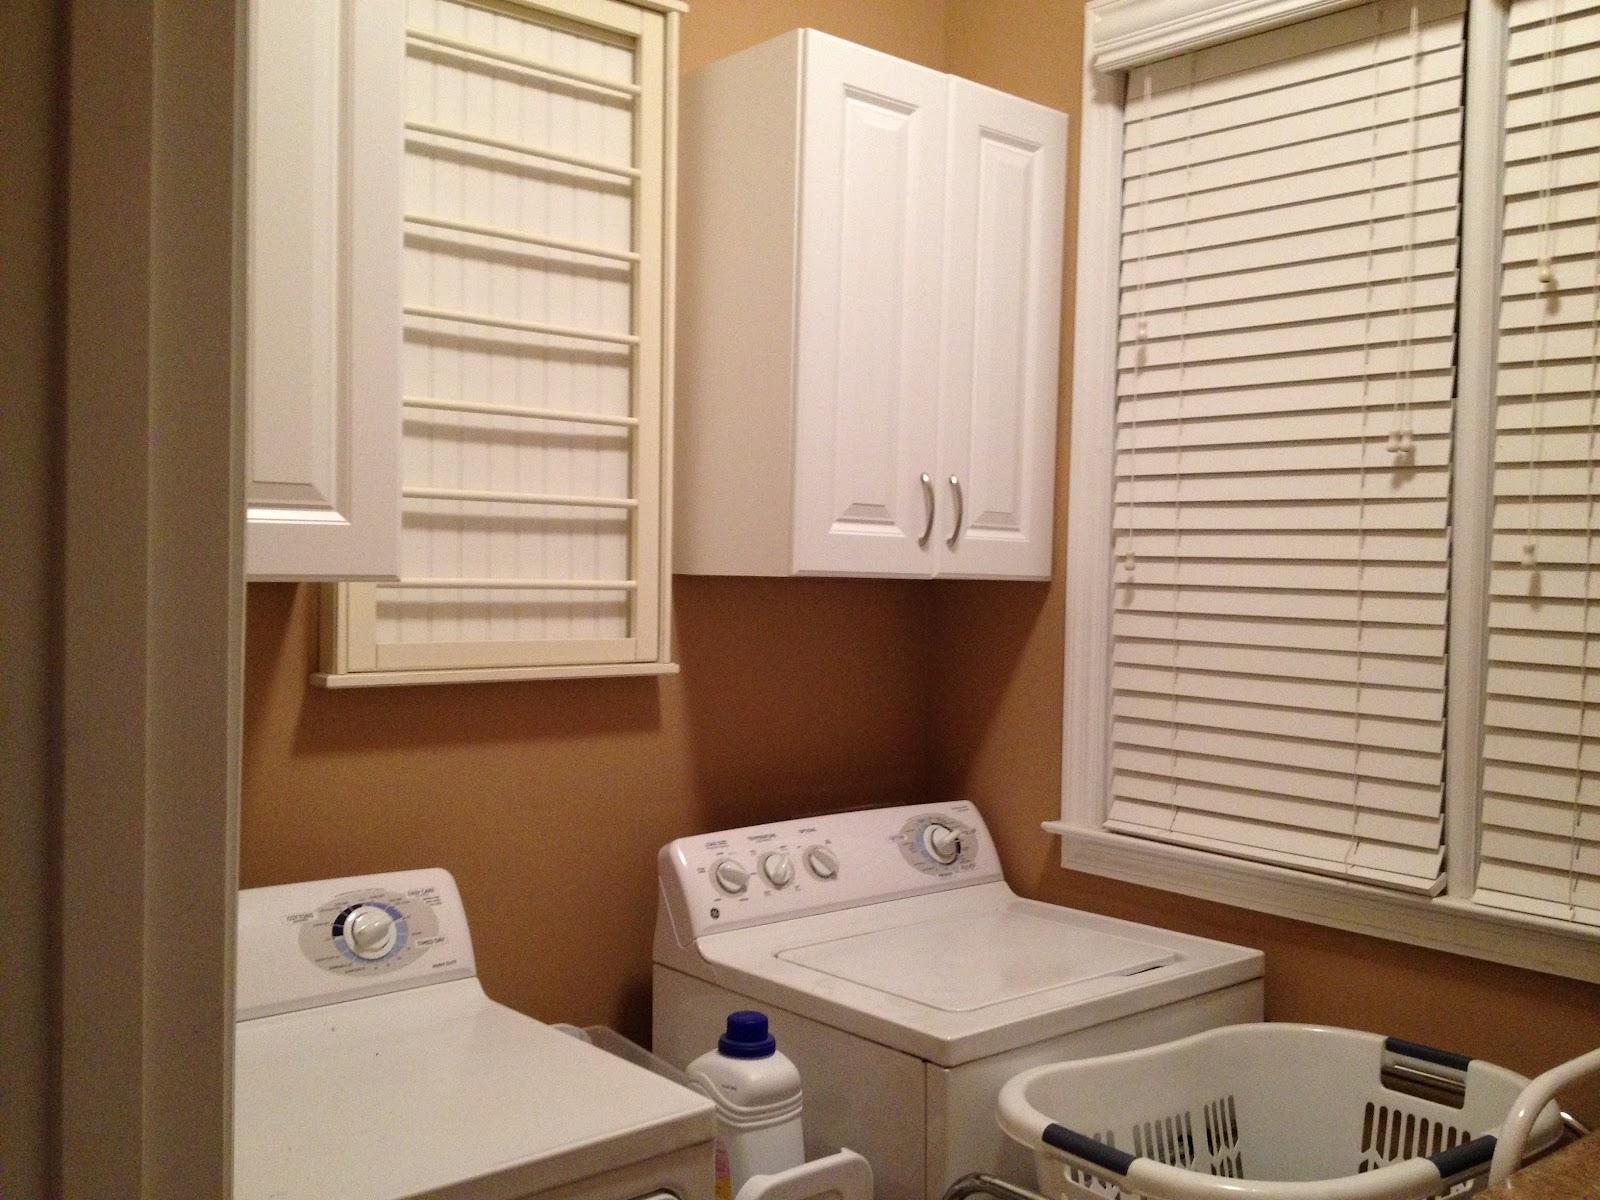 Casalupoli Laundry Room Update Bye Bye Wire Mesh Shelves